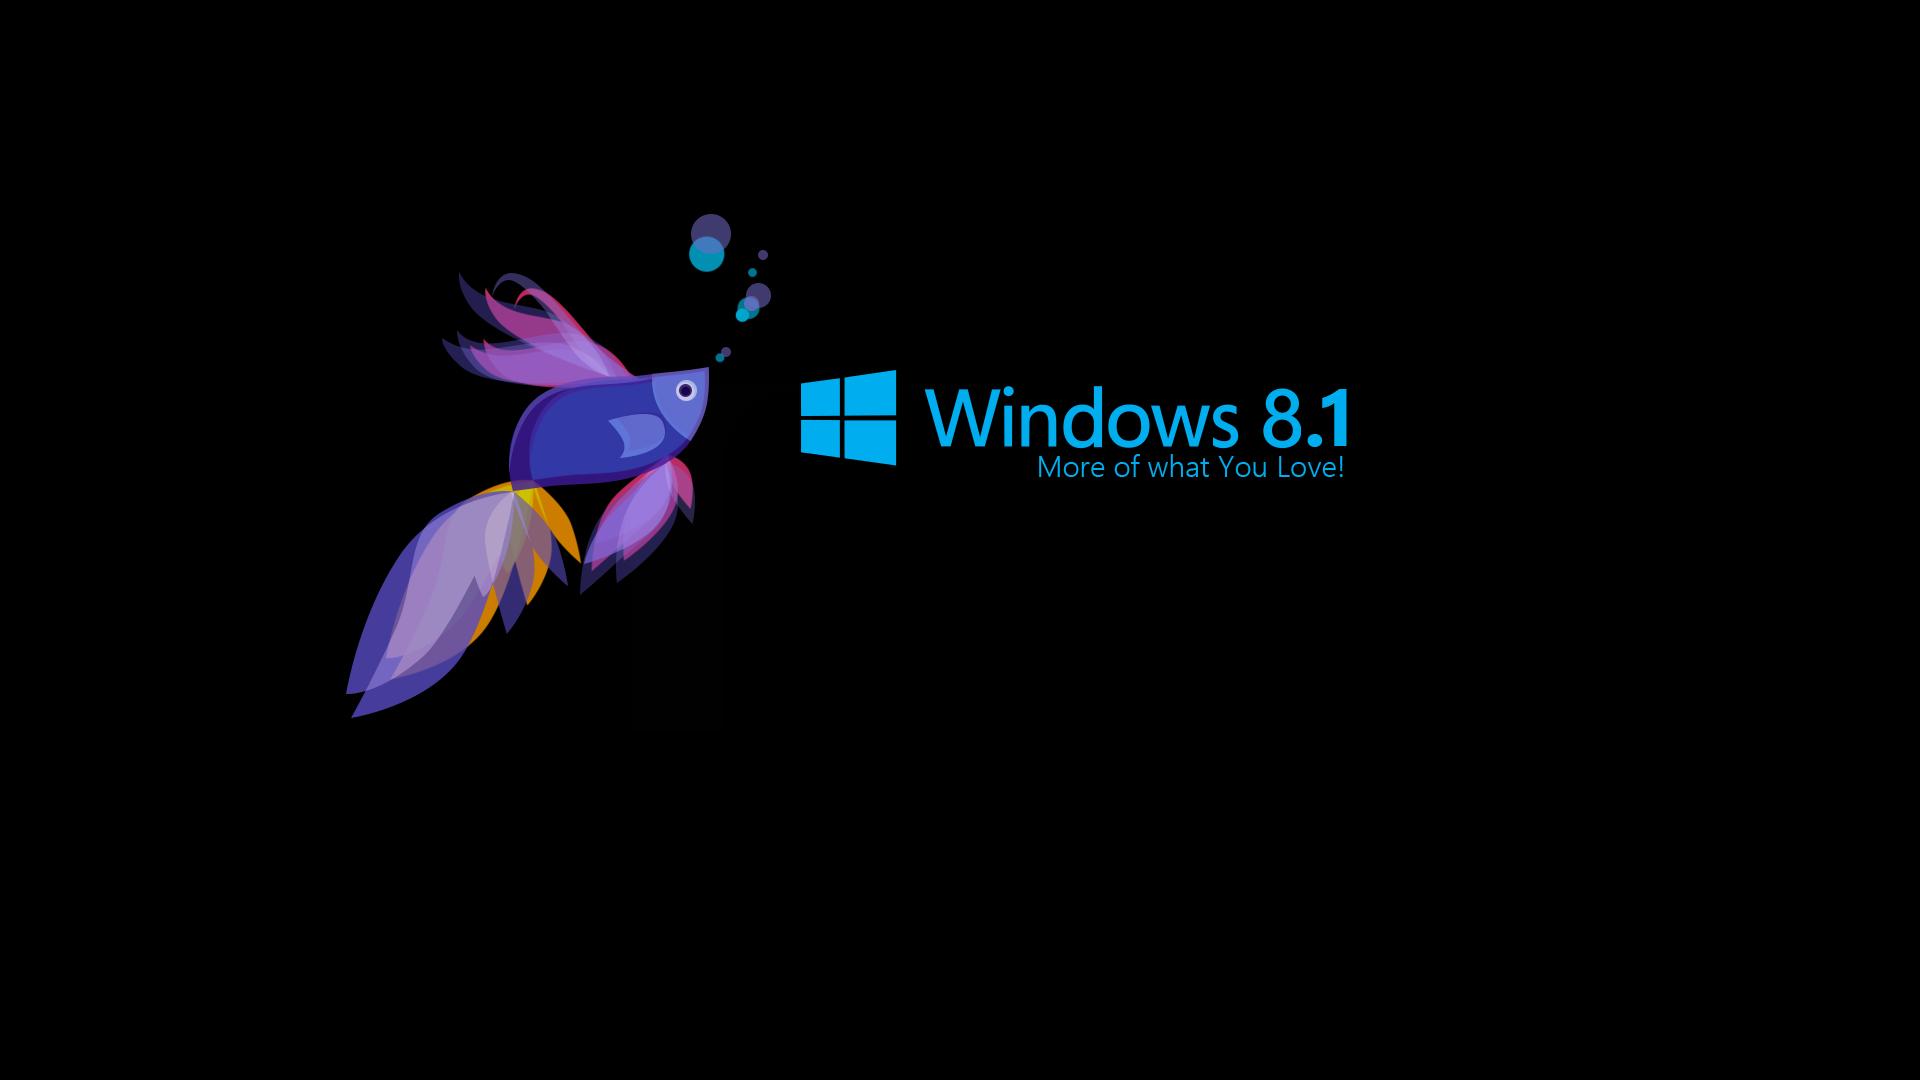 download free wallpapers hd windows 8 1 desktop widescreen